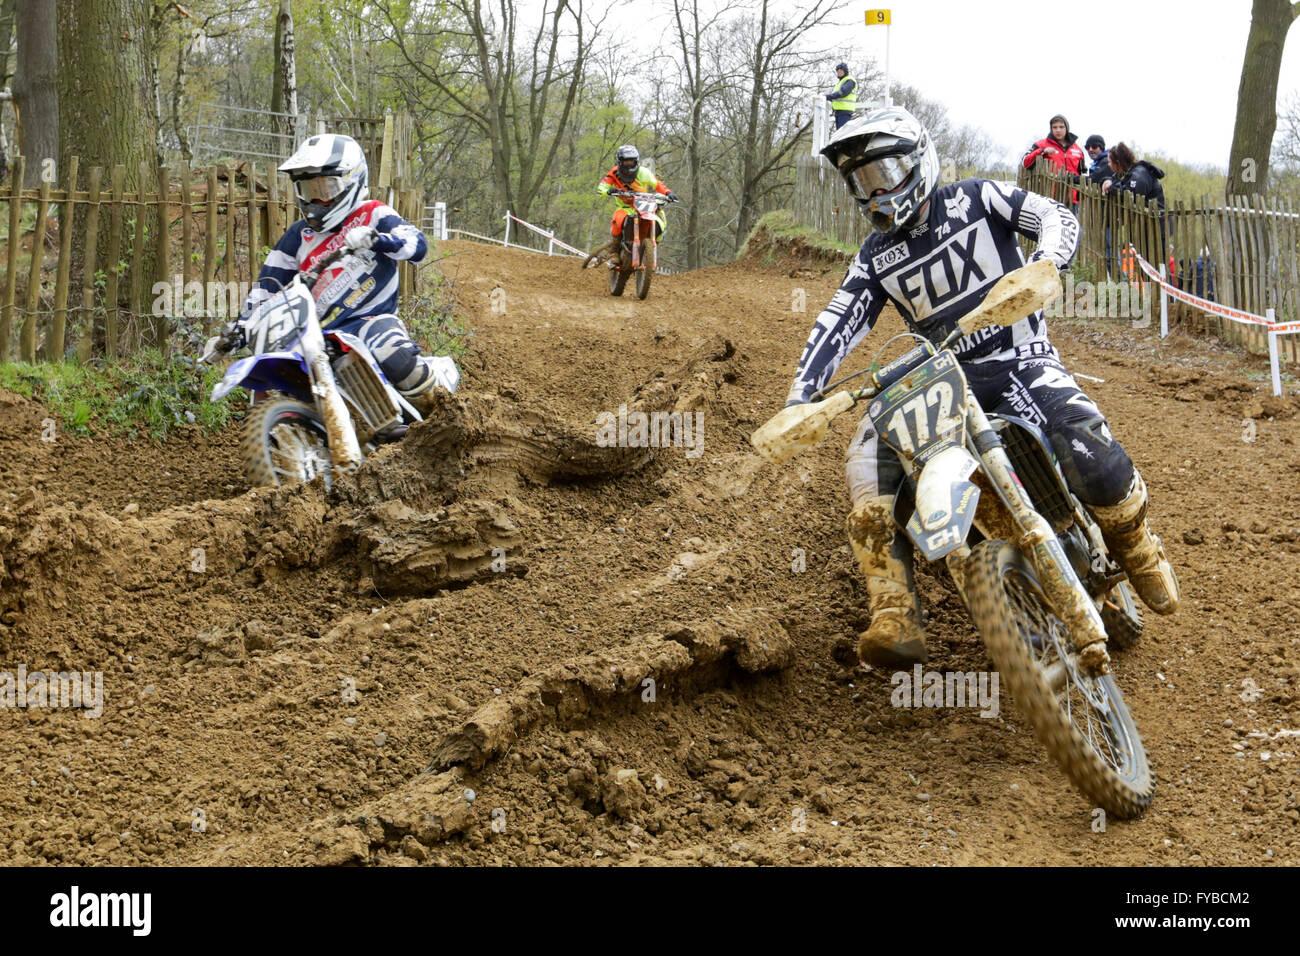 Kent, UK. 24th April, 2016. Maxxis Motocross Championship Round 2 at Canada Heights April 24th Credit:  Jason Richardson/Alamy - Stock Image